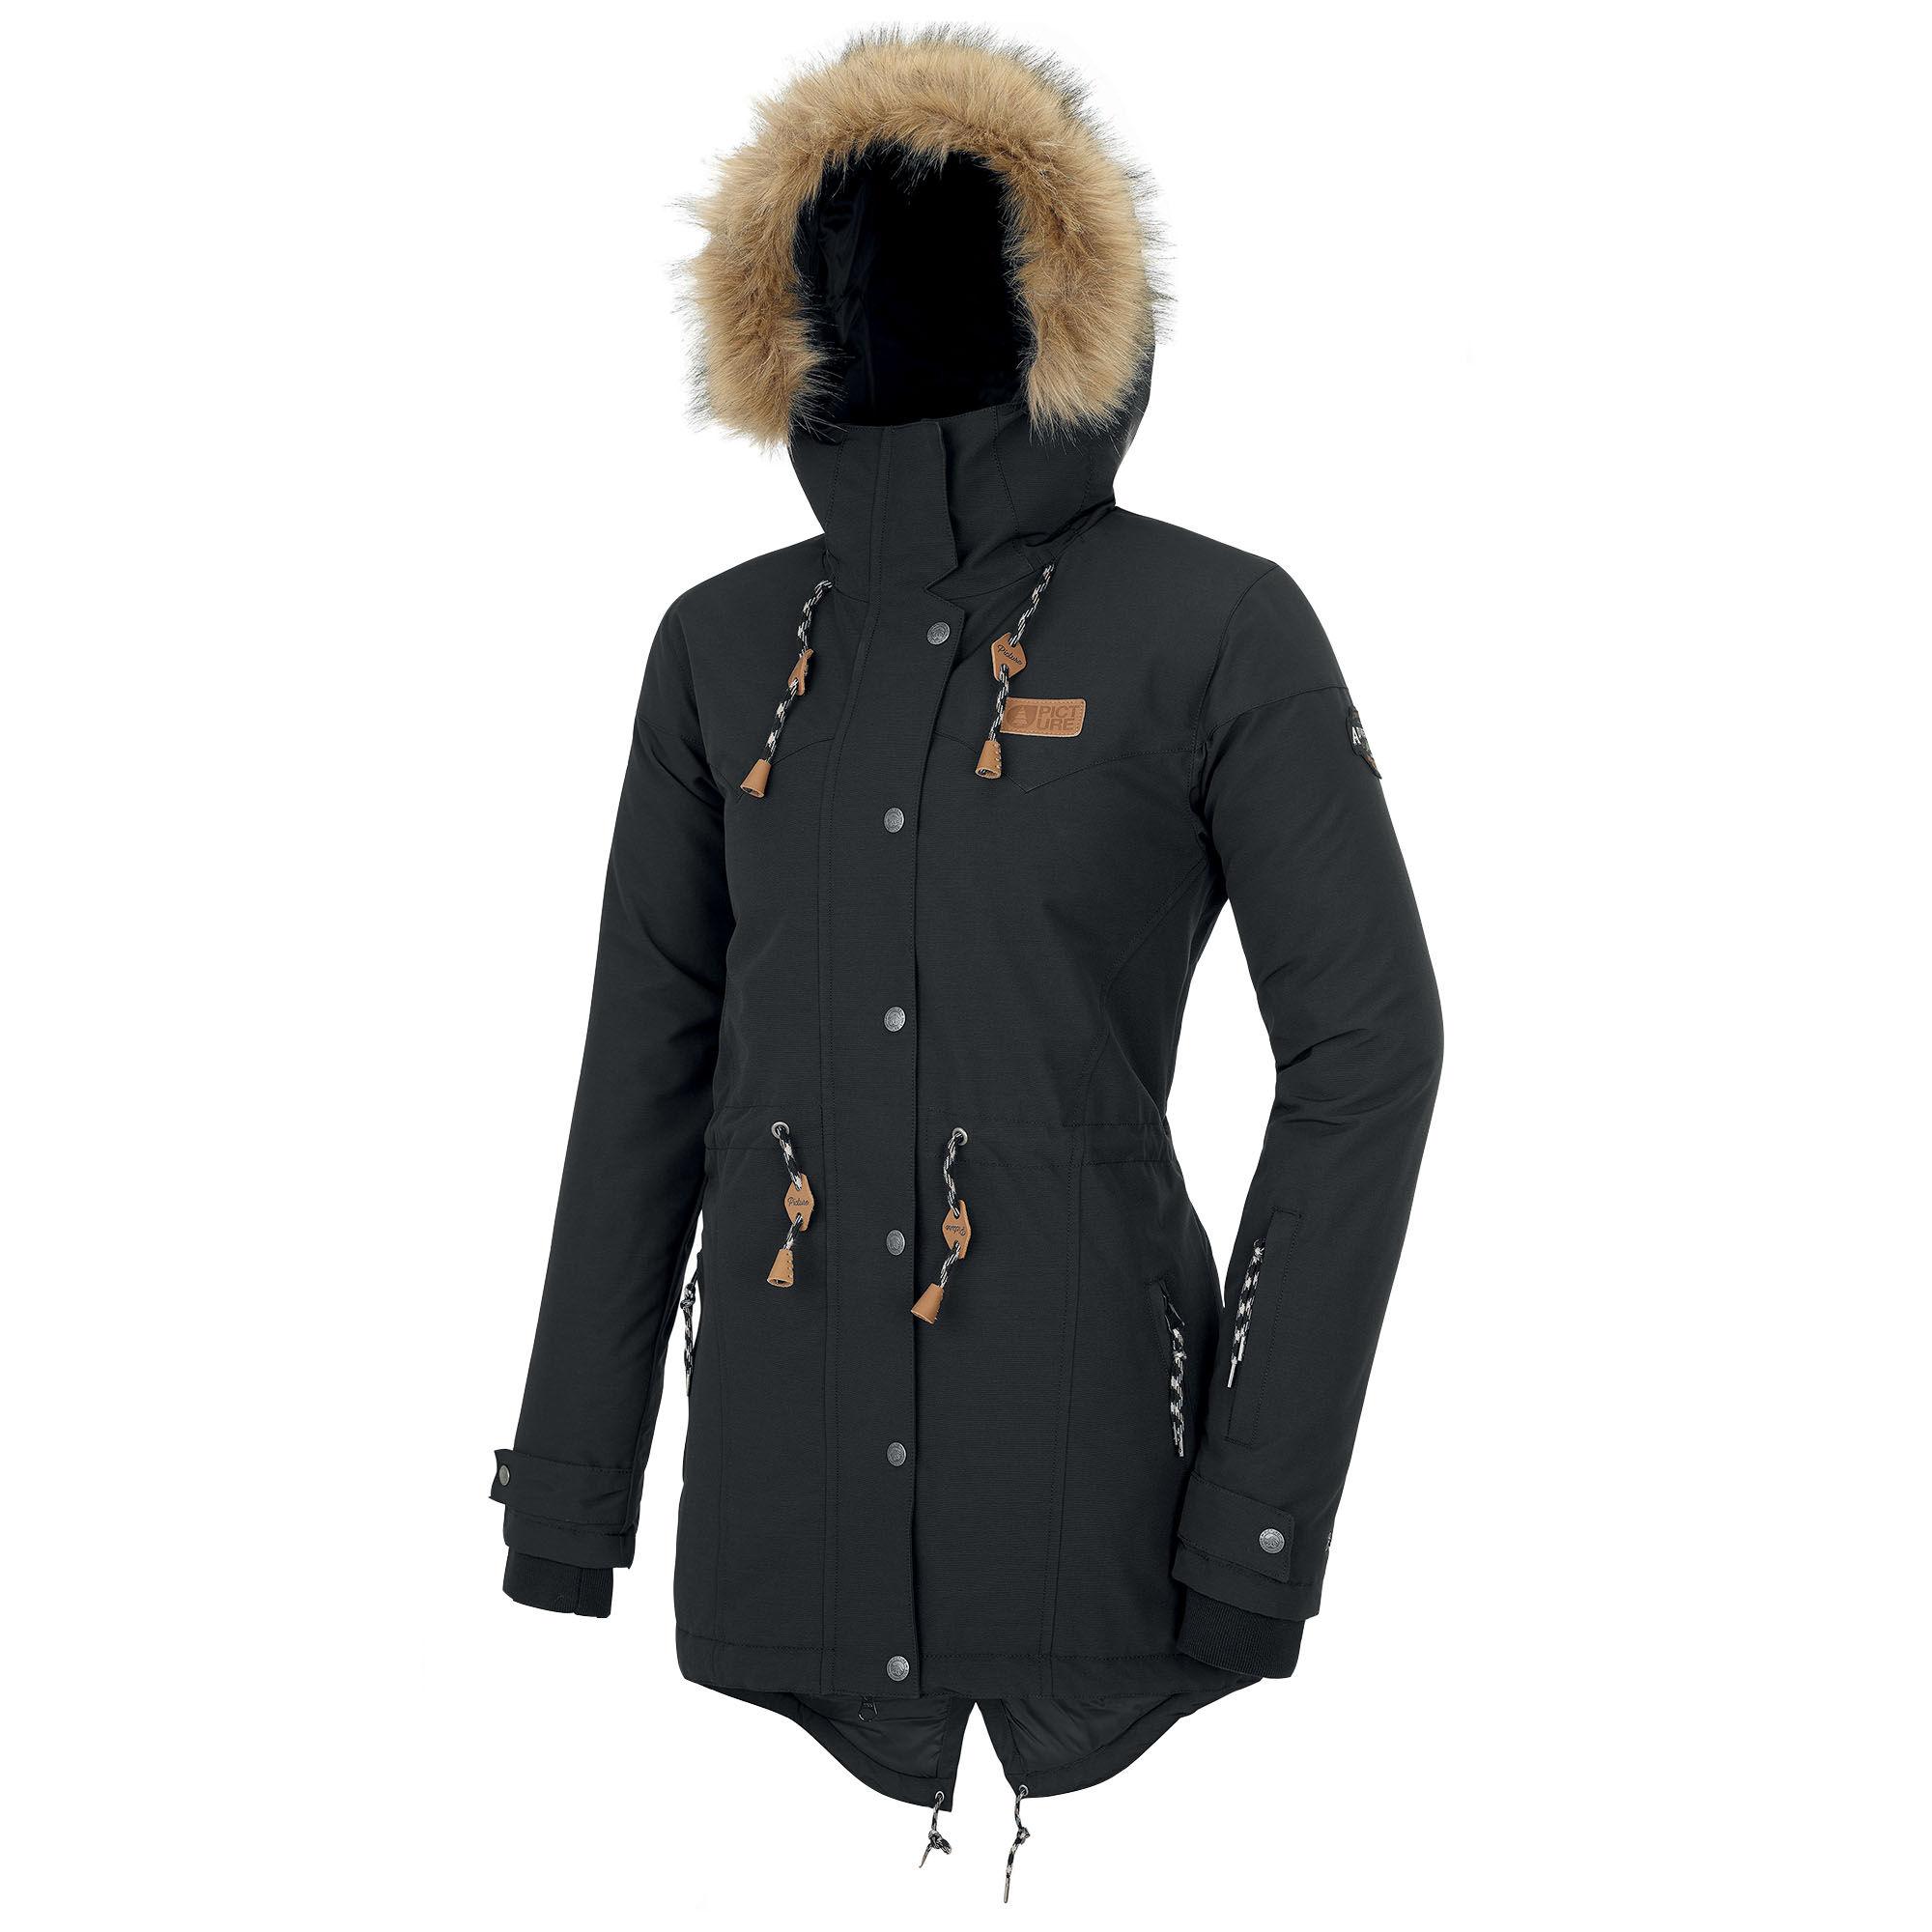 Picture Organic Clothing Women's Katniss Snow Jacket  - Black - Size: Medium